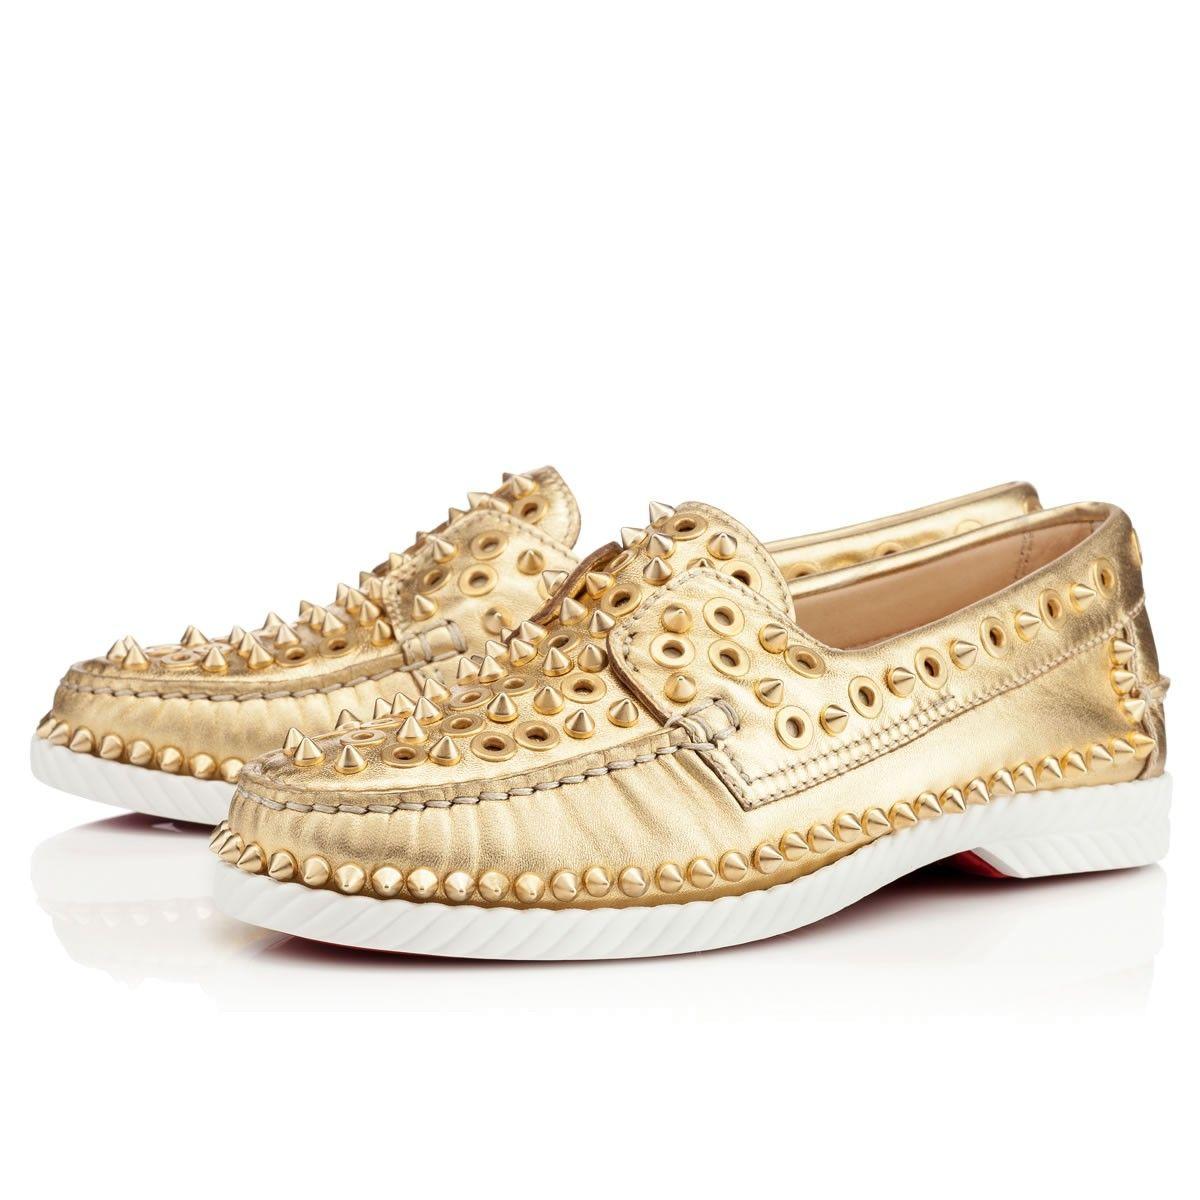 615e7b9c894 Christian Louboutin Yacht Spikes Flat in Gold